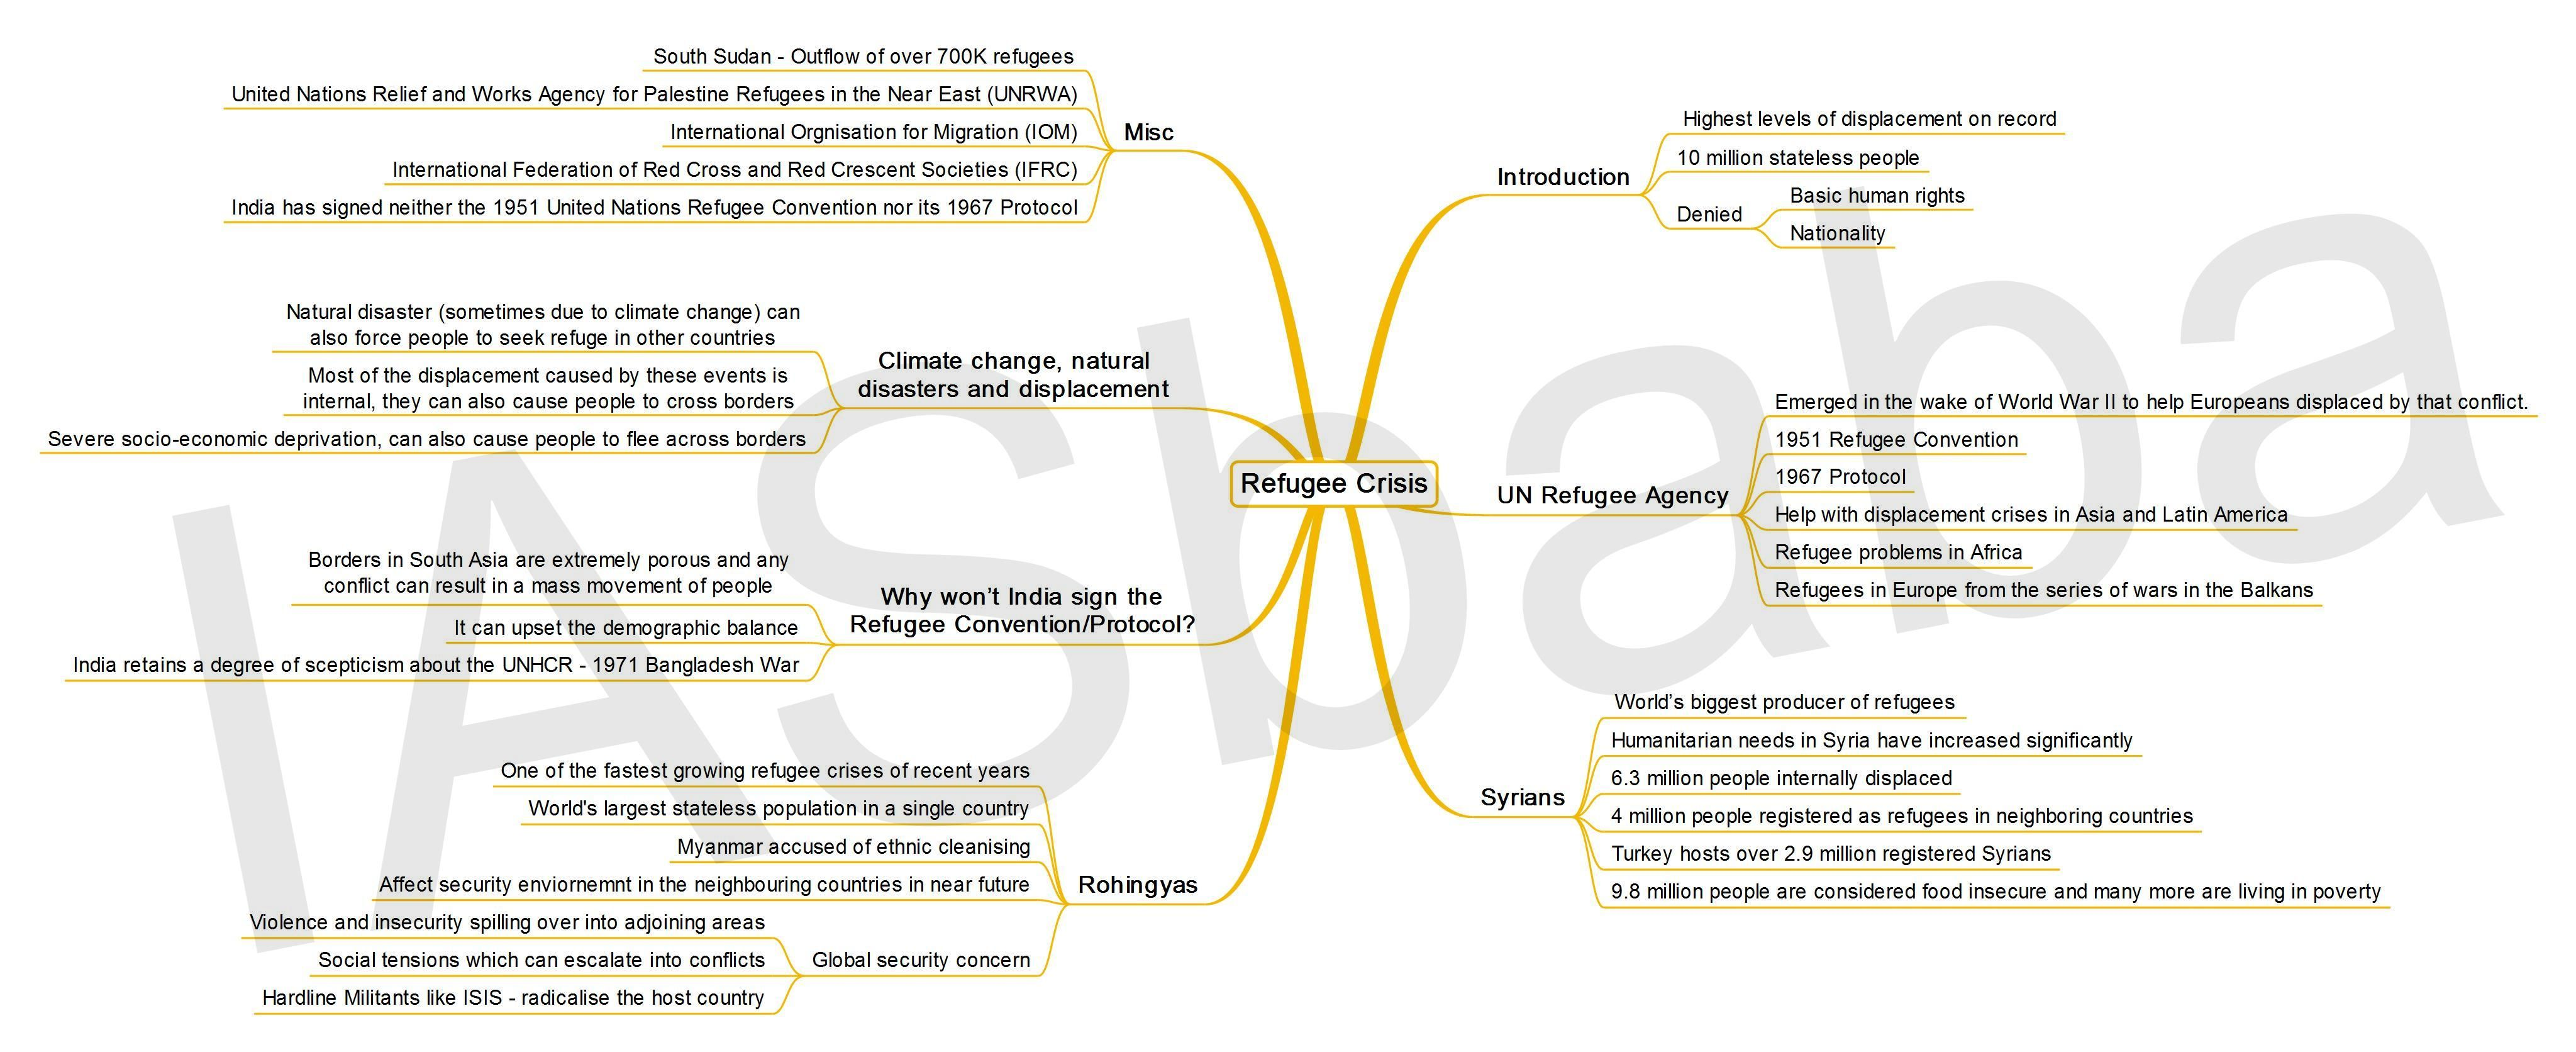 Pin by Vaishali on UPSC | Refugee crisis, Social issues, Creative